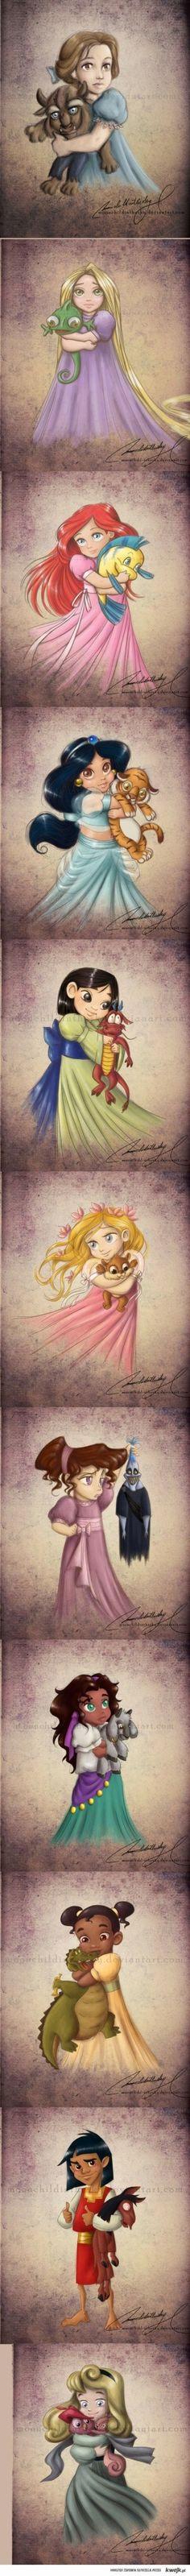 Disney - little children